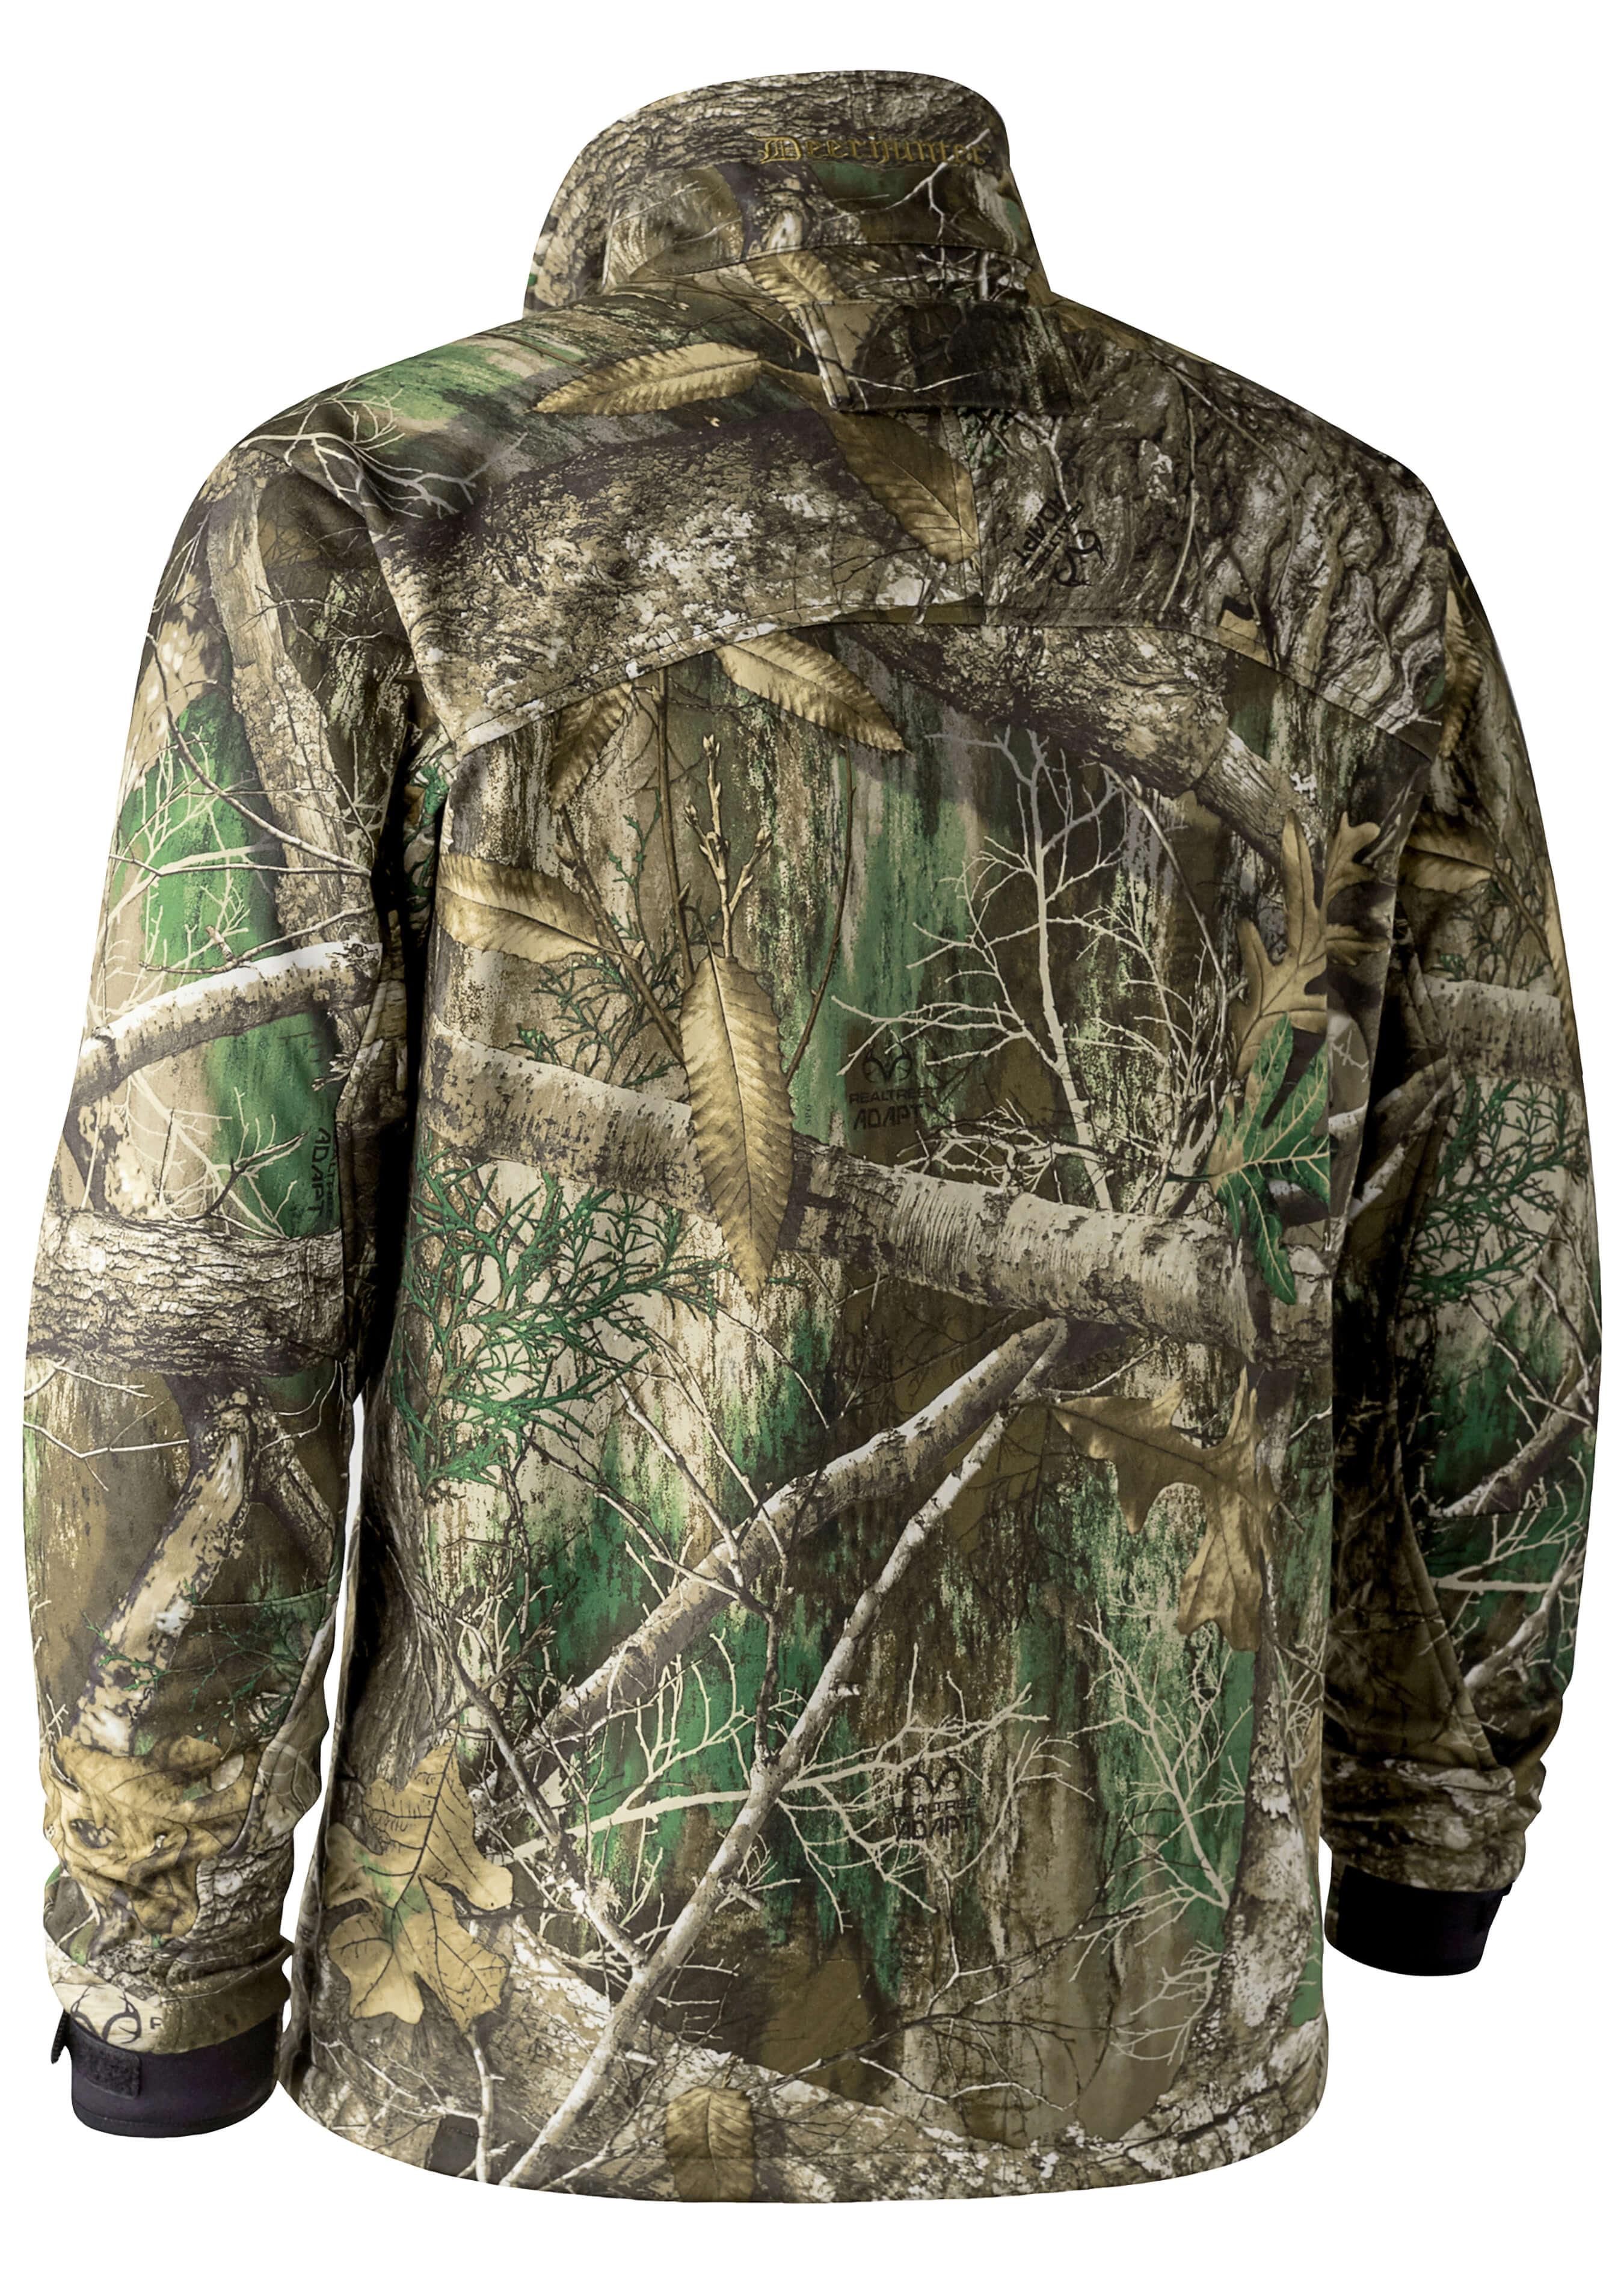 veste de chasse Approach Realtree 26072748 2